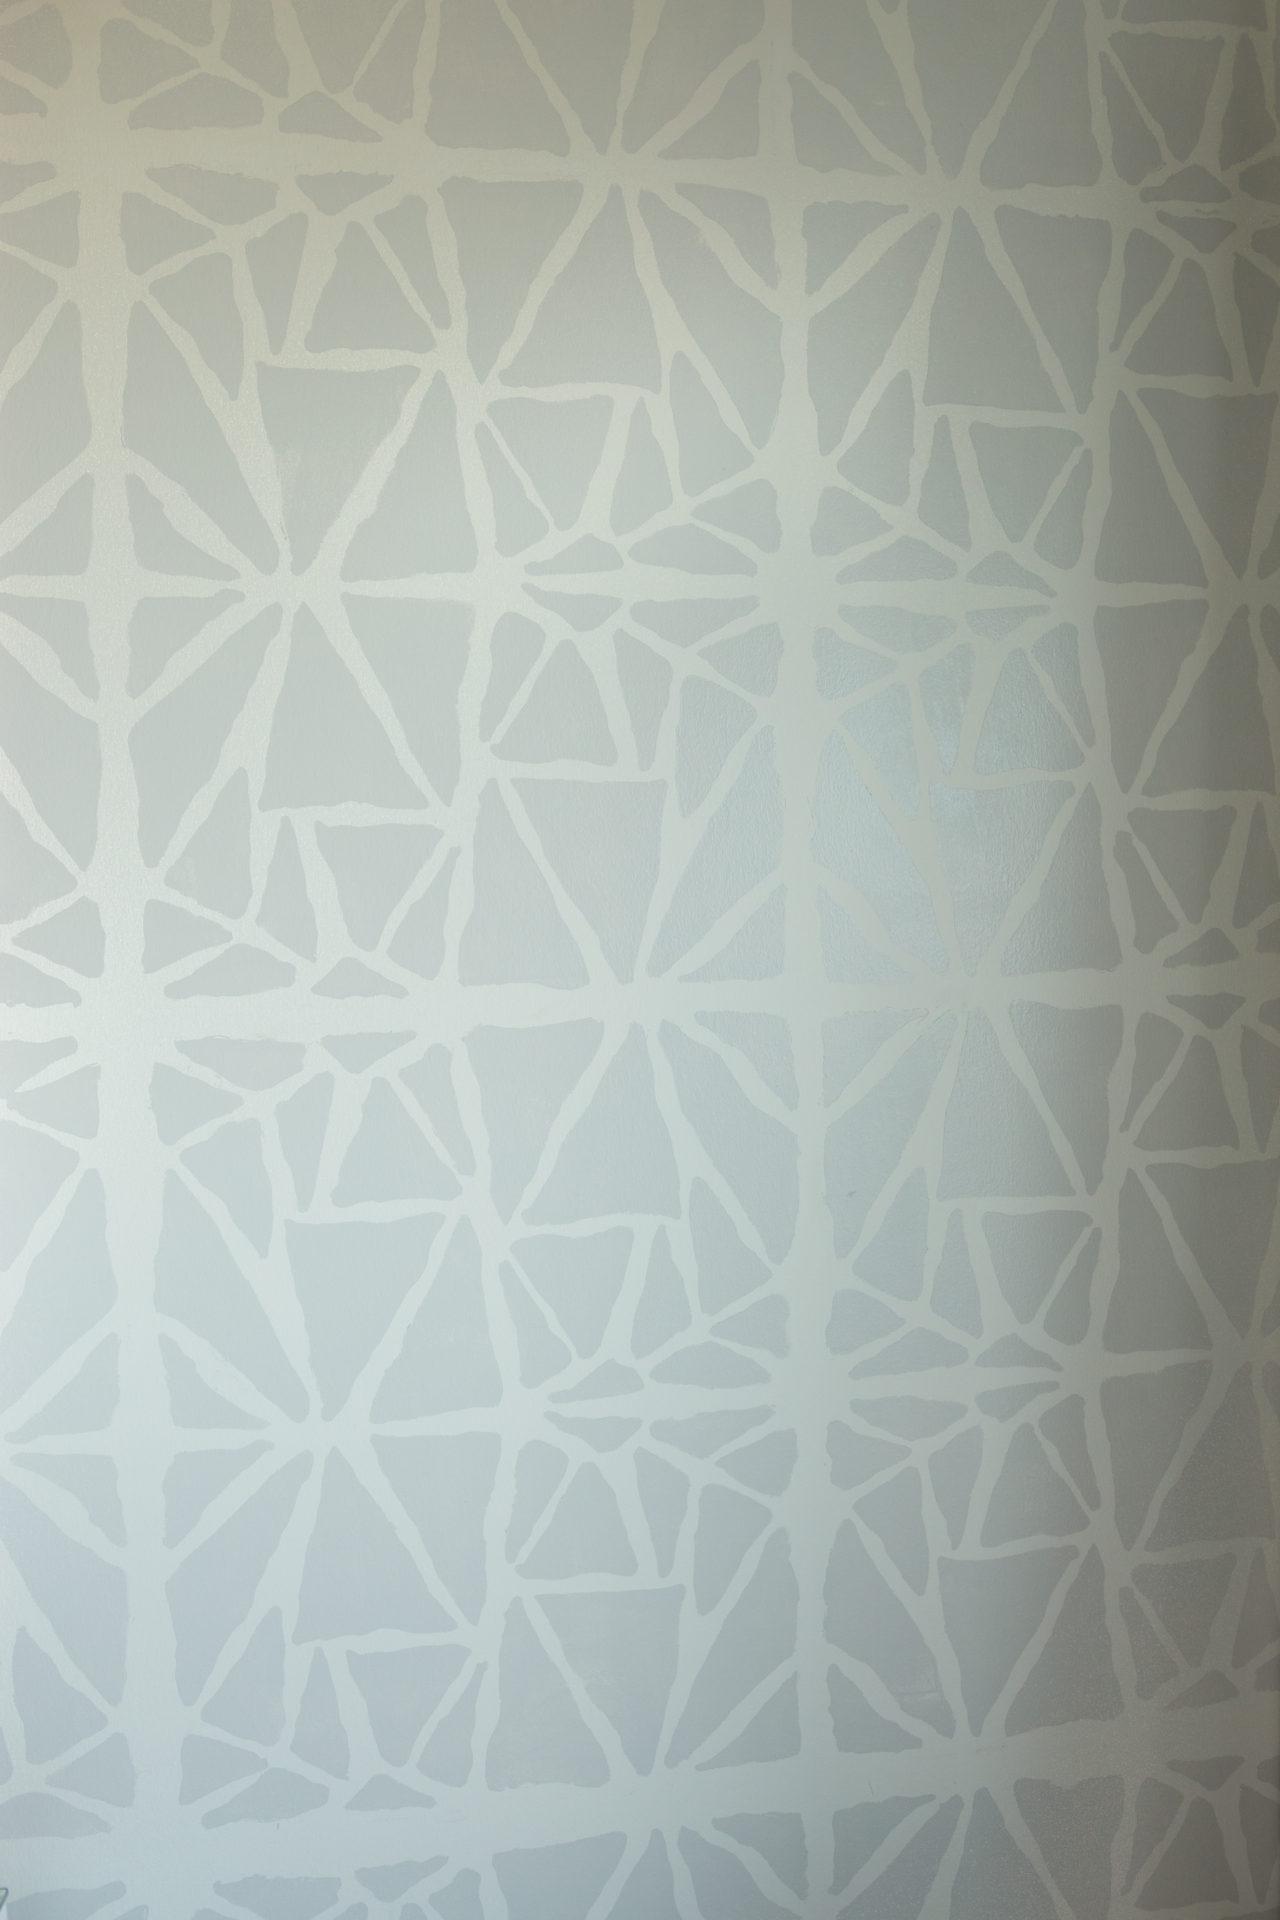 MrKate_DIY_Stencil_Wall (13 of 13)